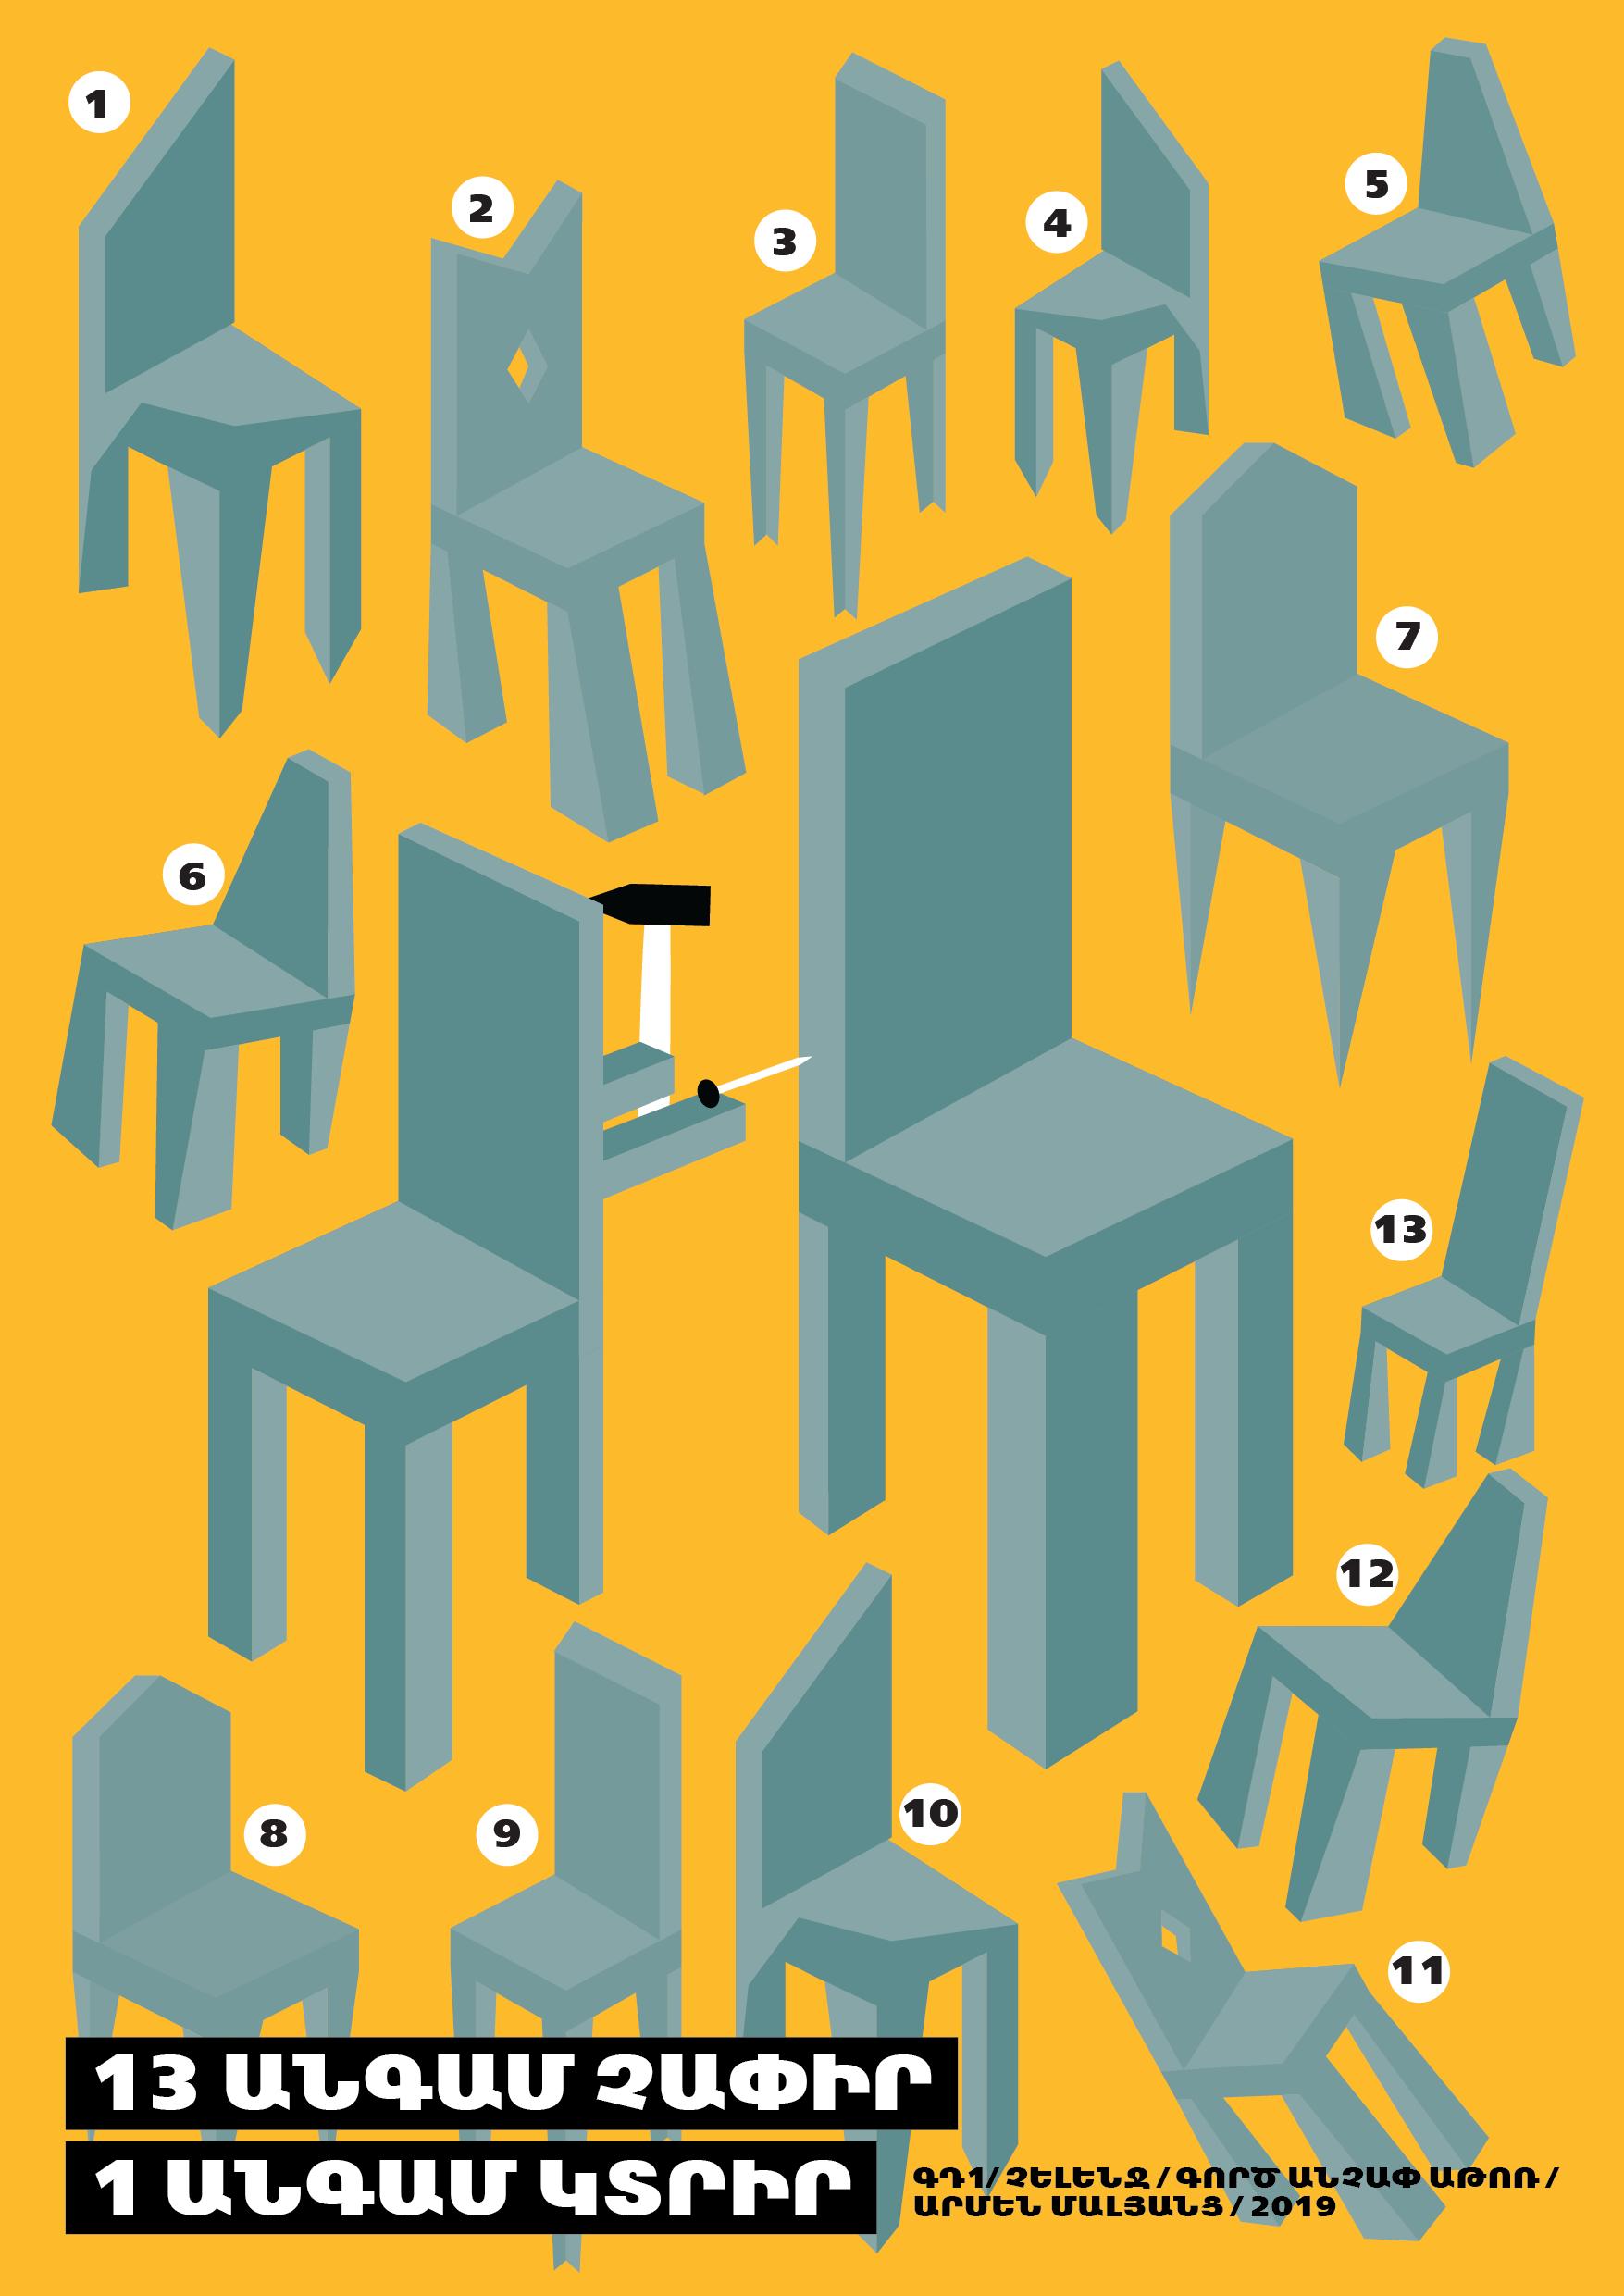 level 1 gd1 armen 02 - Գրաֆիկական դիզայն